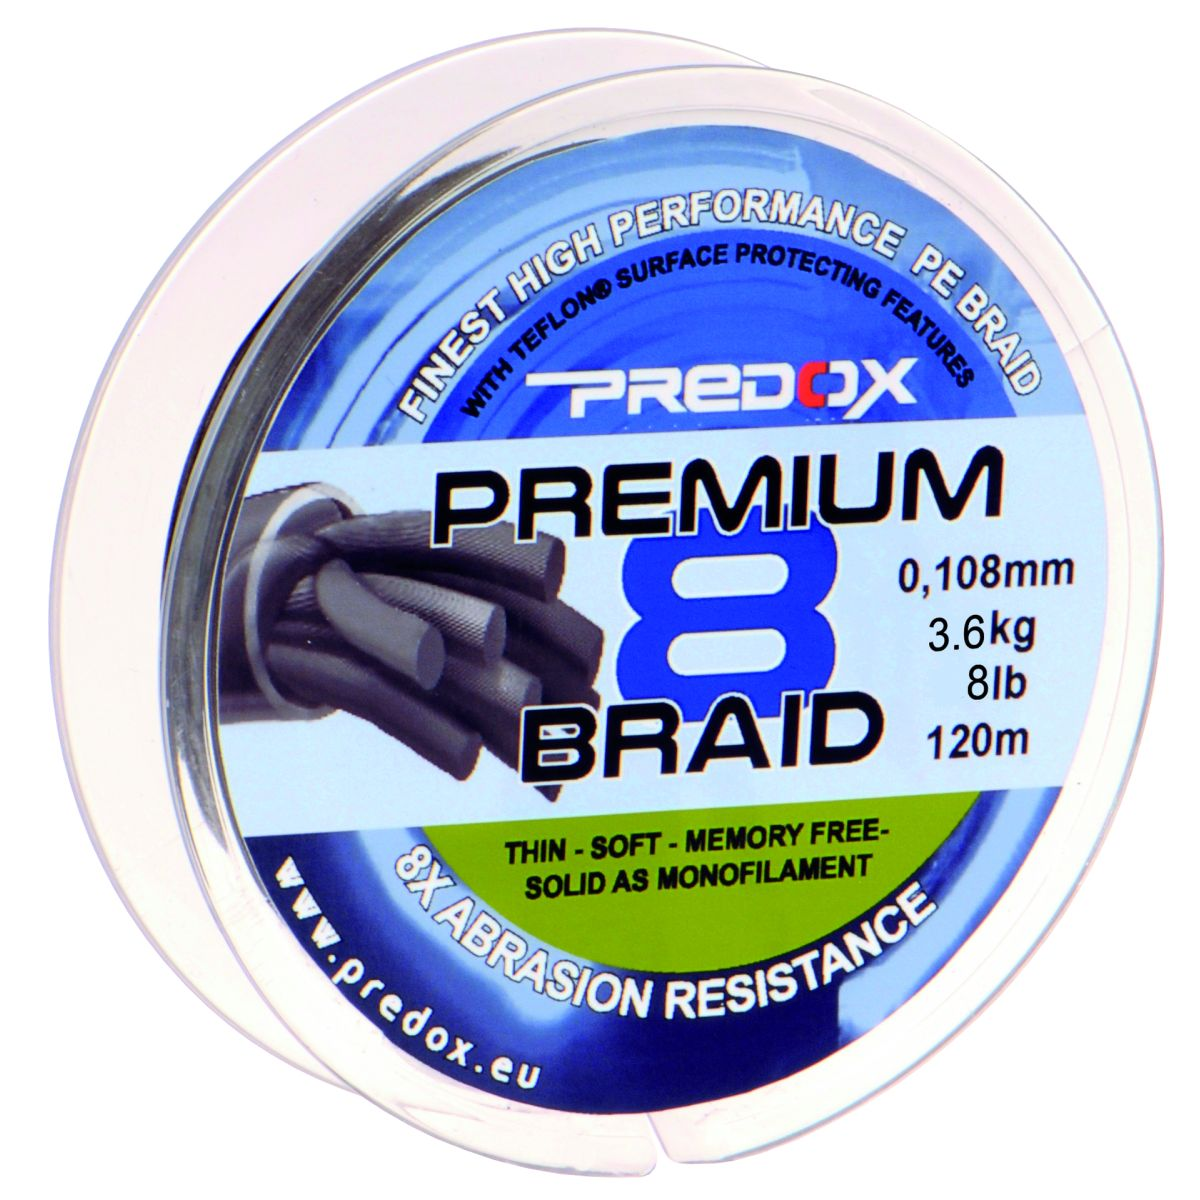 FUS. PREM.8-BRD. 0,108/120/3.6 N 00001